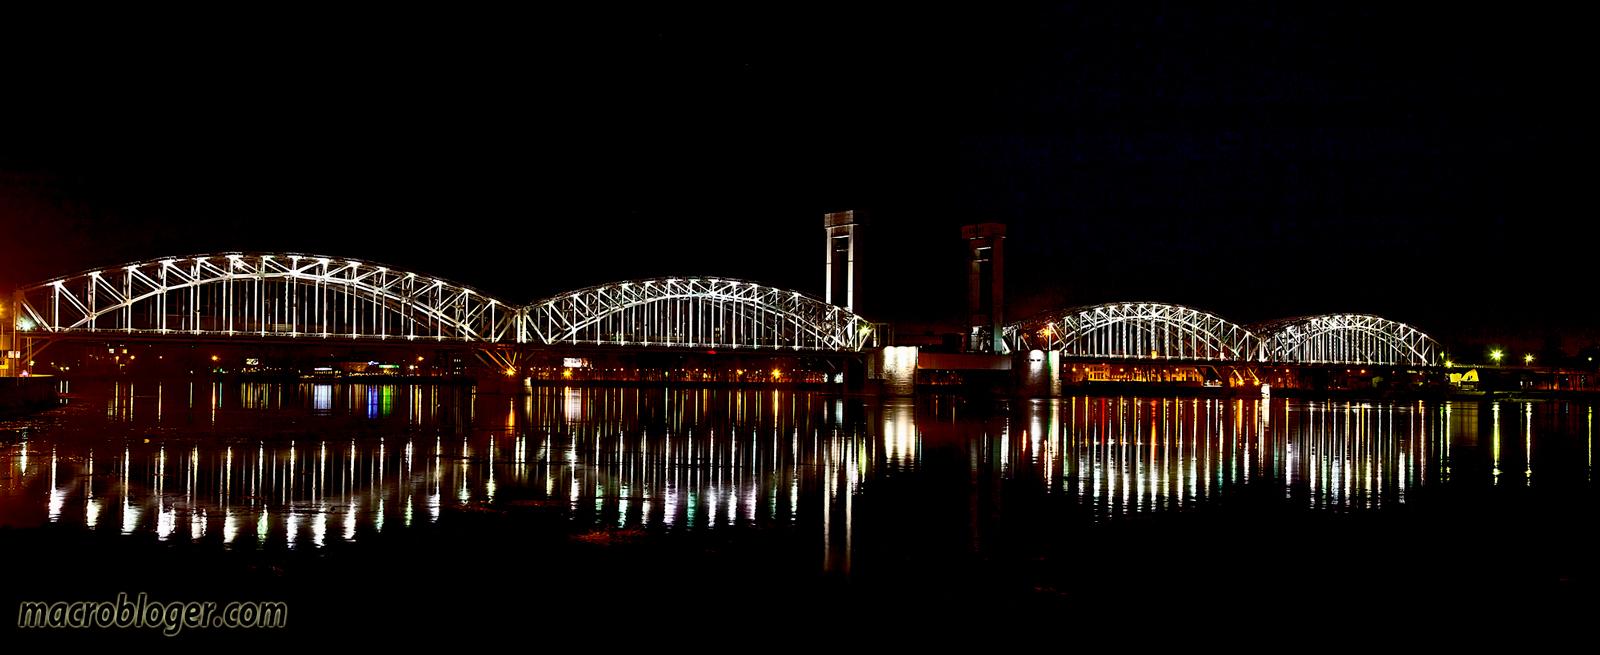 Ночная панорама Финляндского  моста